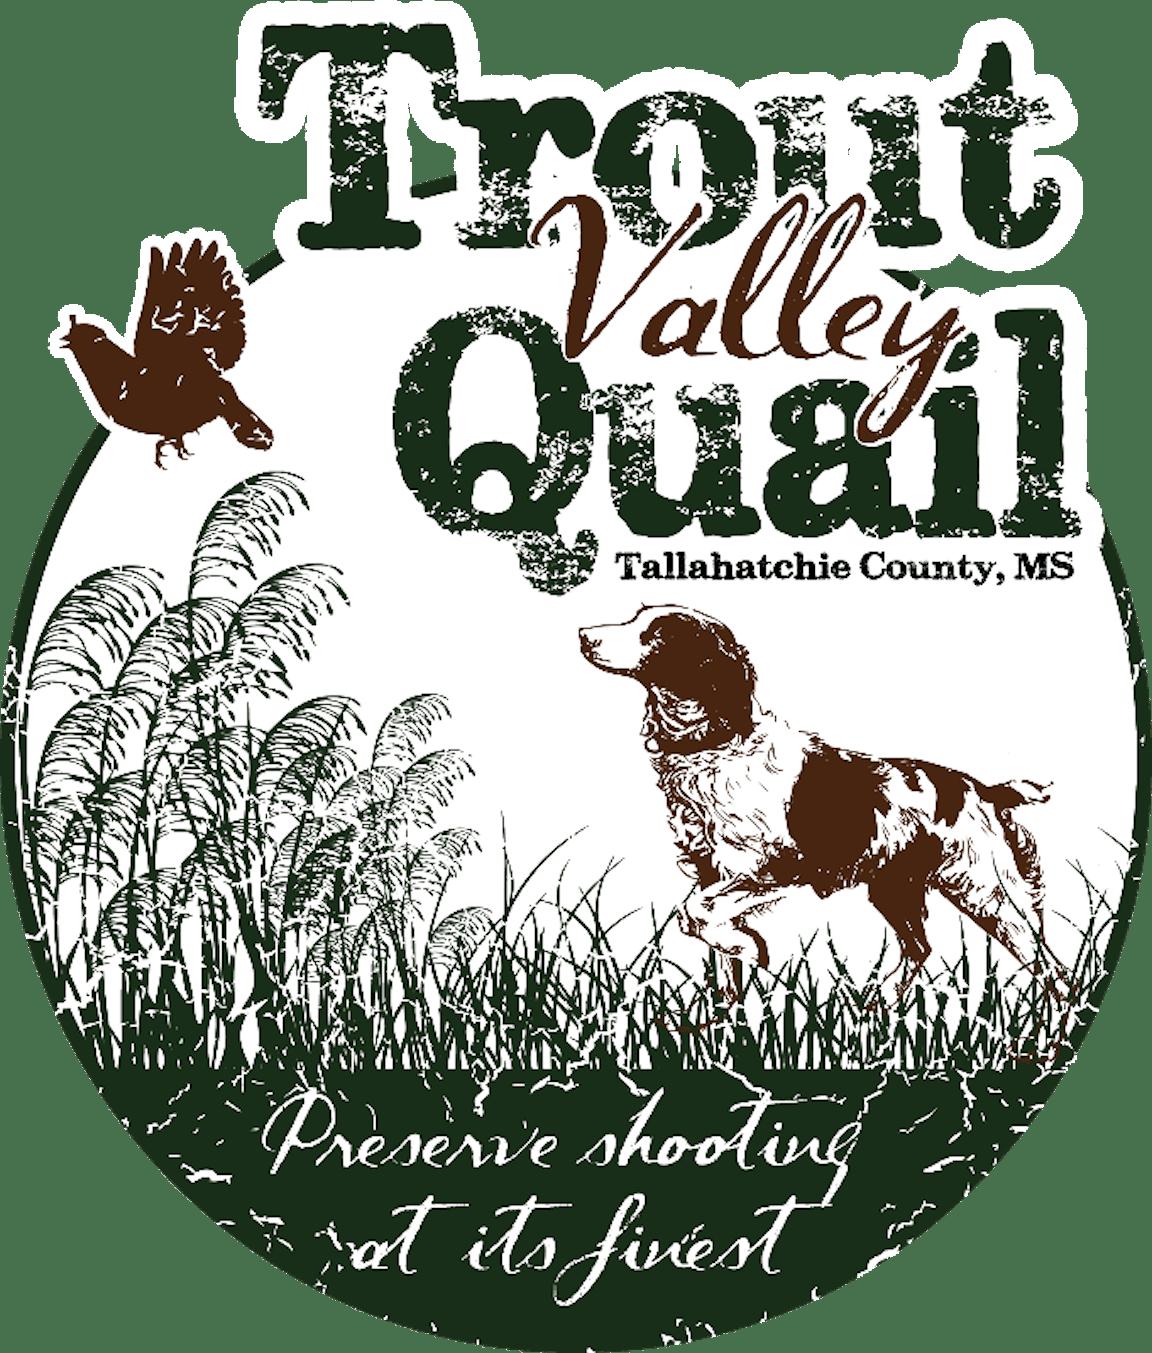 Trout Valley Quail